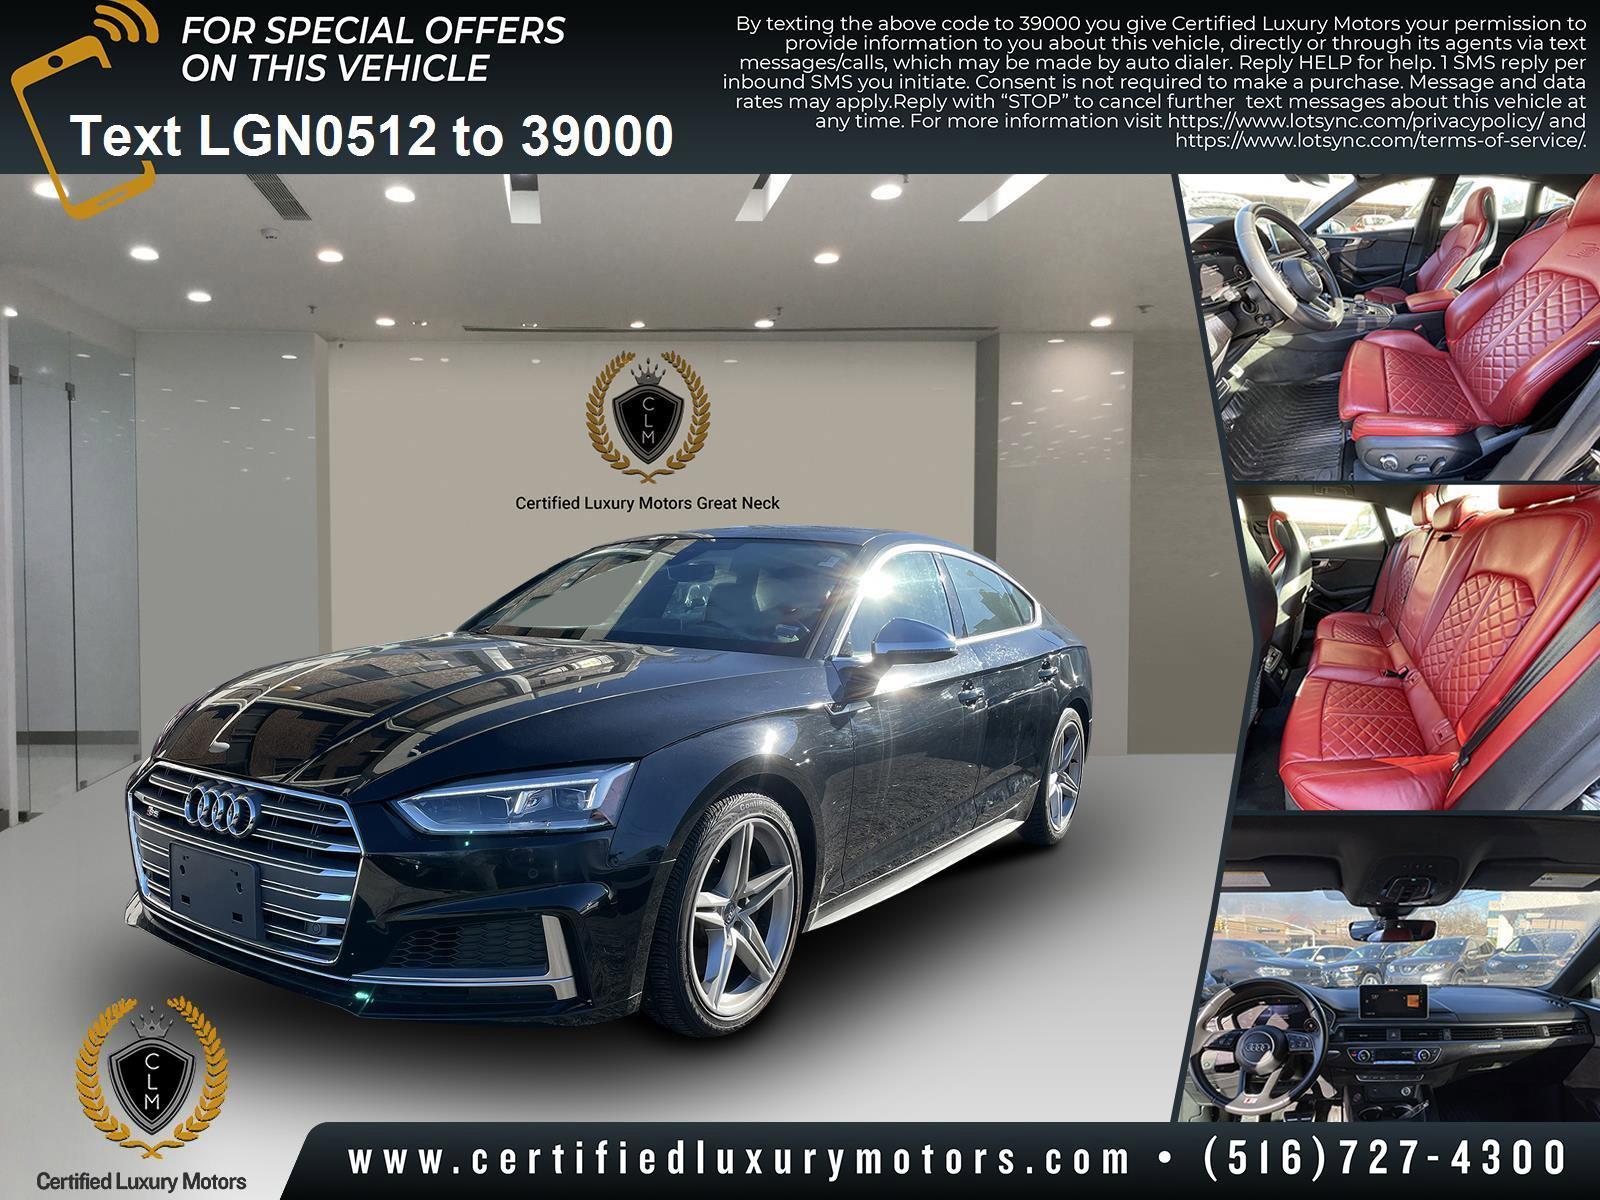 Used 2018 Audi S5 Sportback Premium Plus | Great Neck, NY